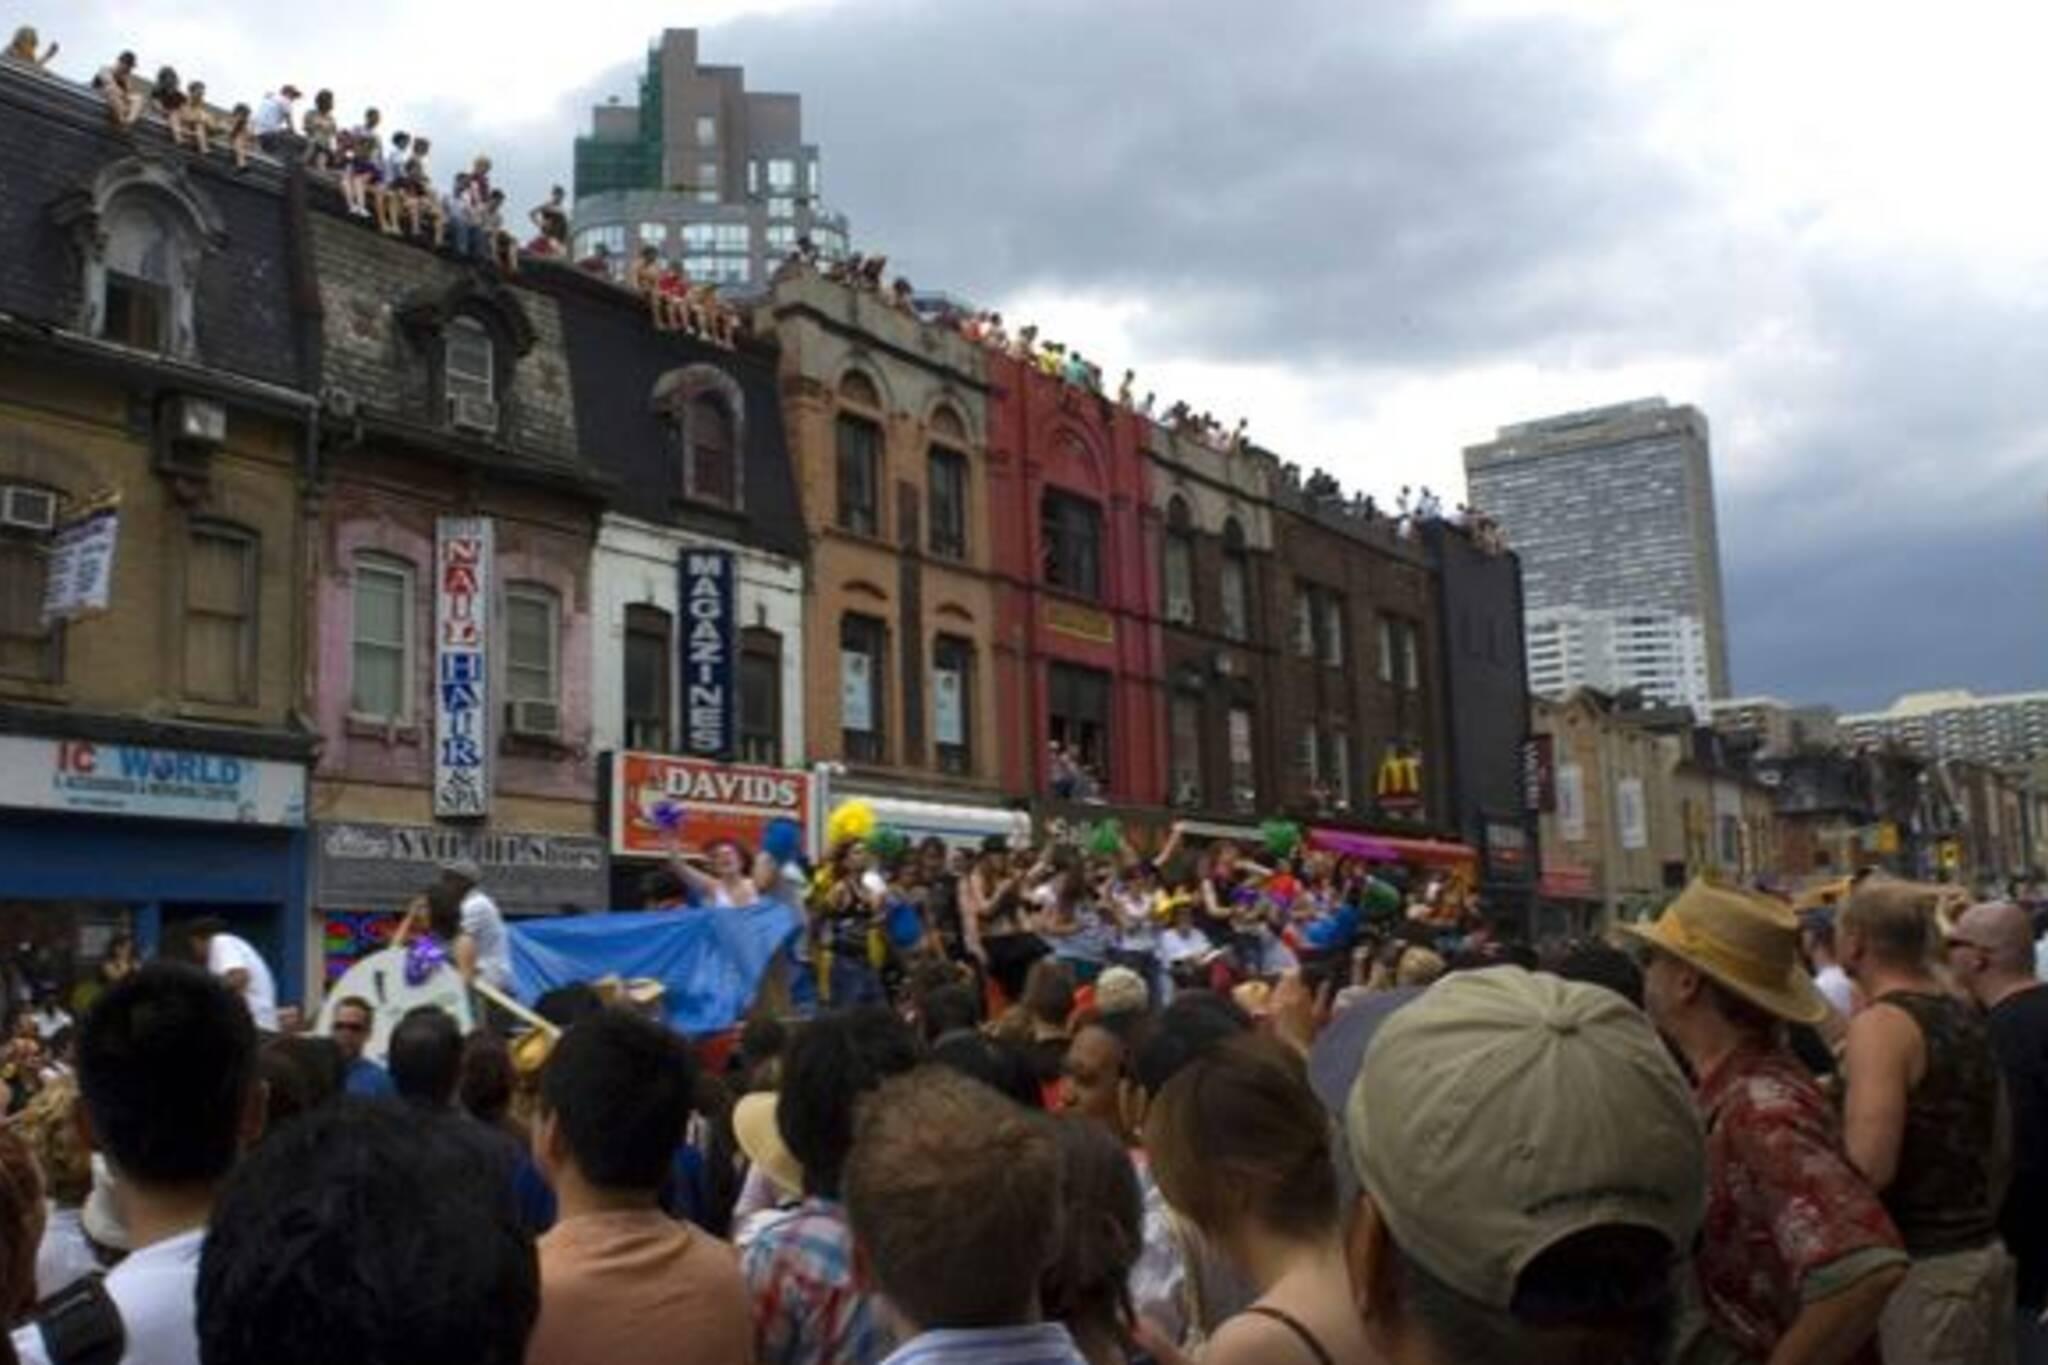 Pride_2008_Toronto_1.jpg